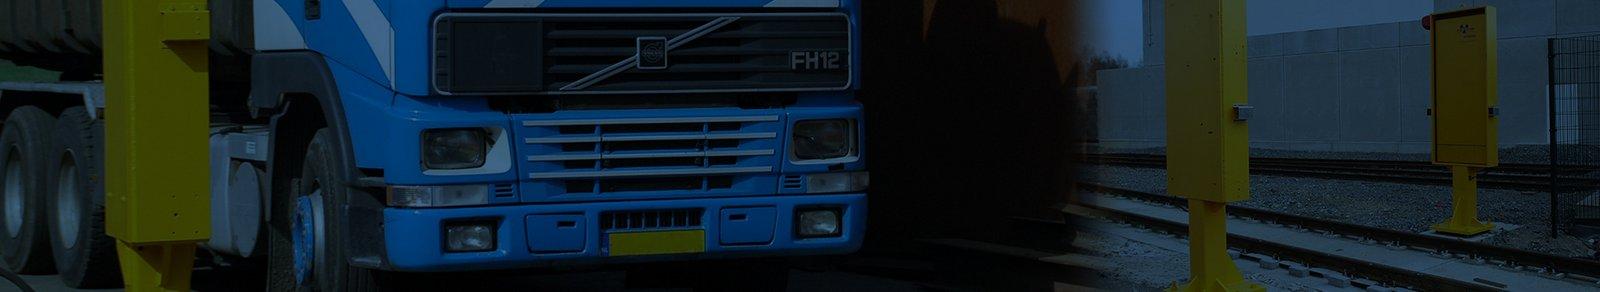 Banner-image-truck-rail2